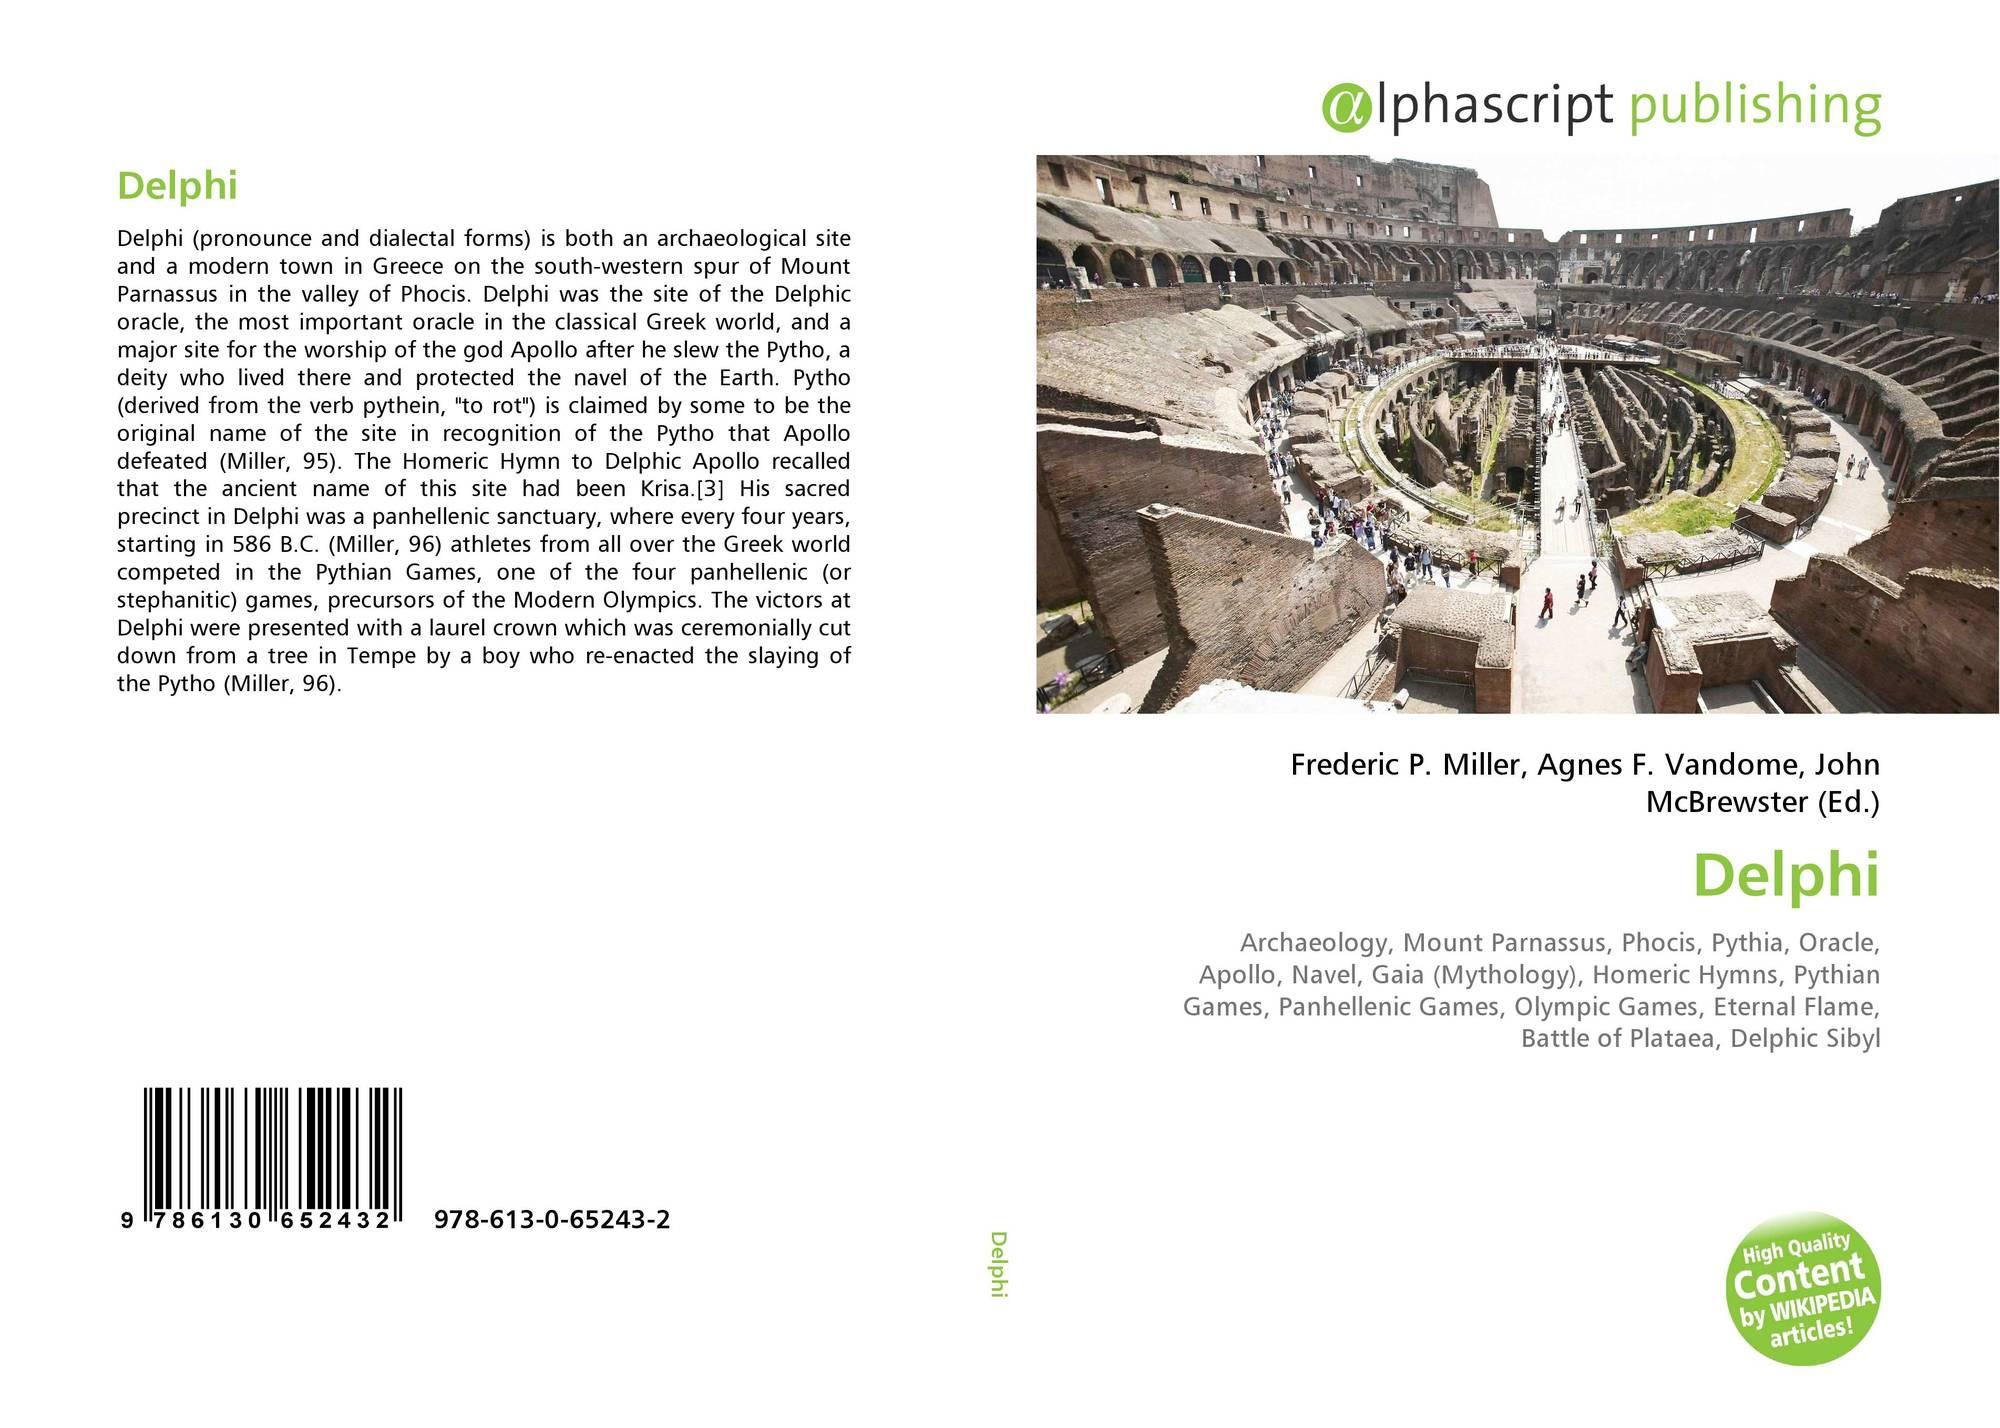 Delphi, 978-613-0-65243-2, 6130652437 ,9786130652432